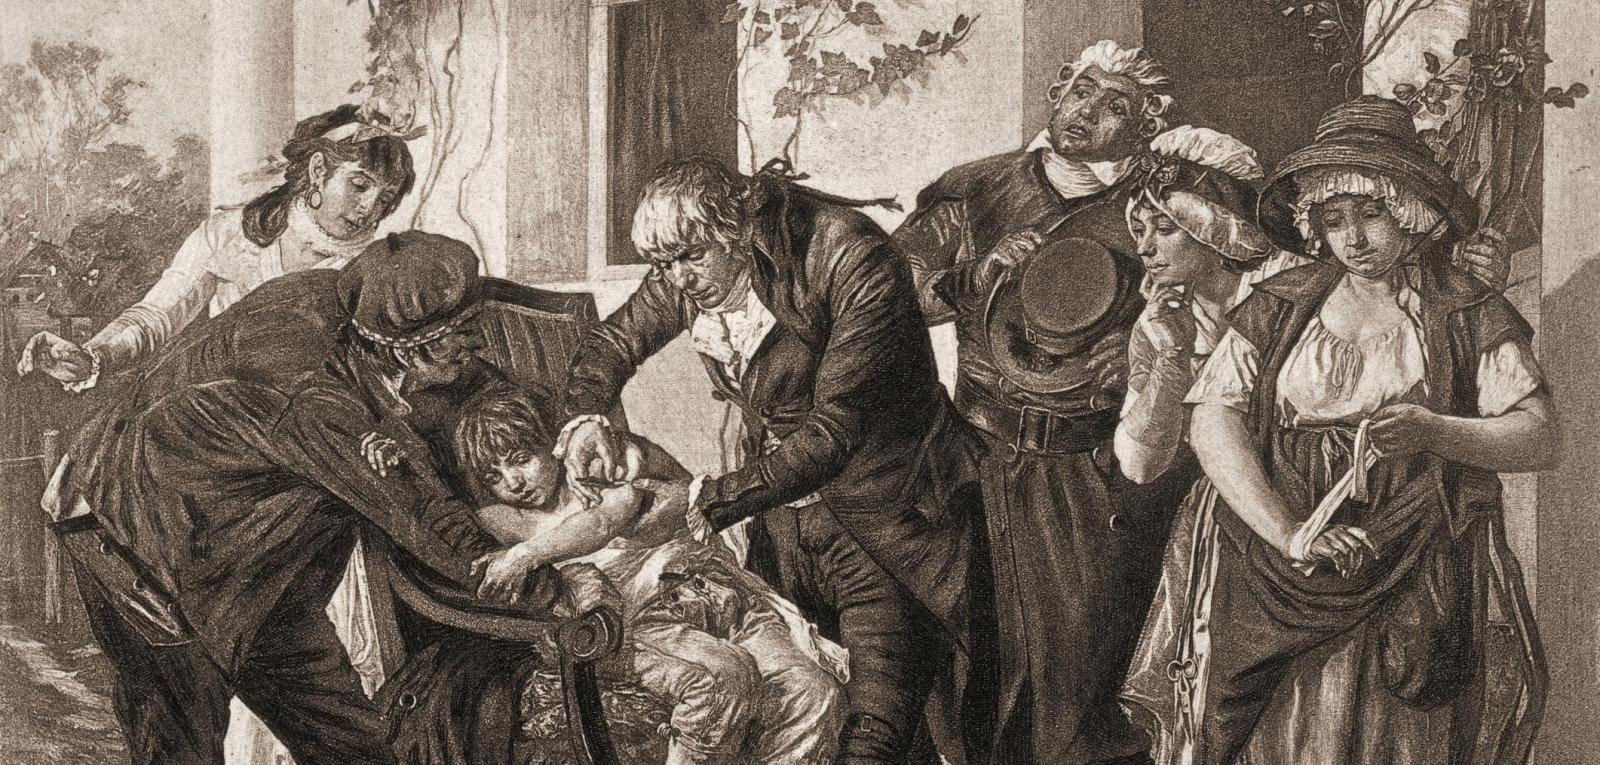 edward-jenner-gives-a-vaccine.jpg